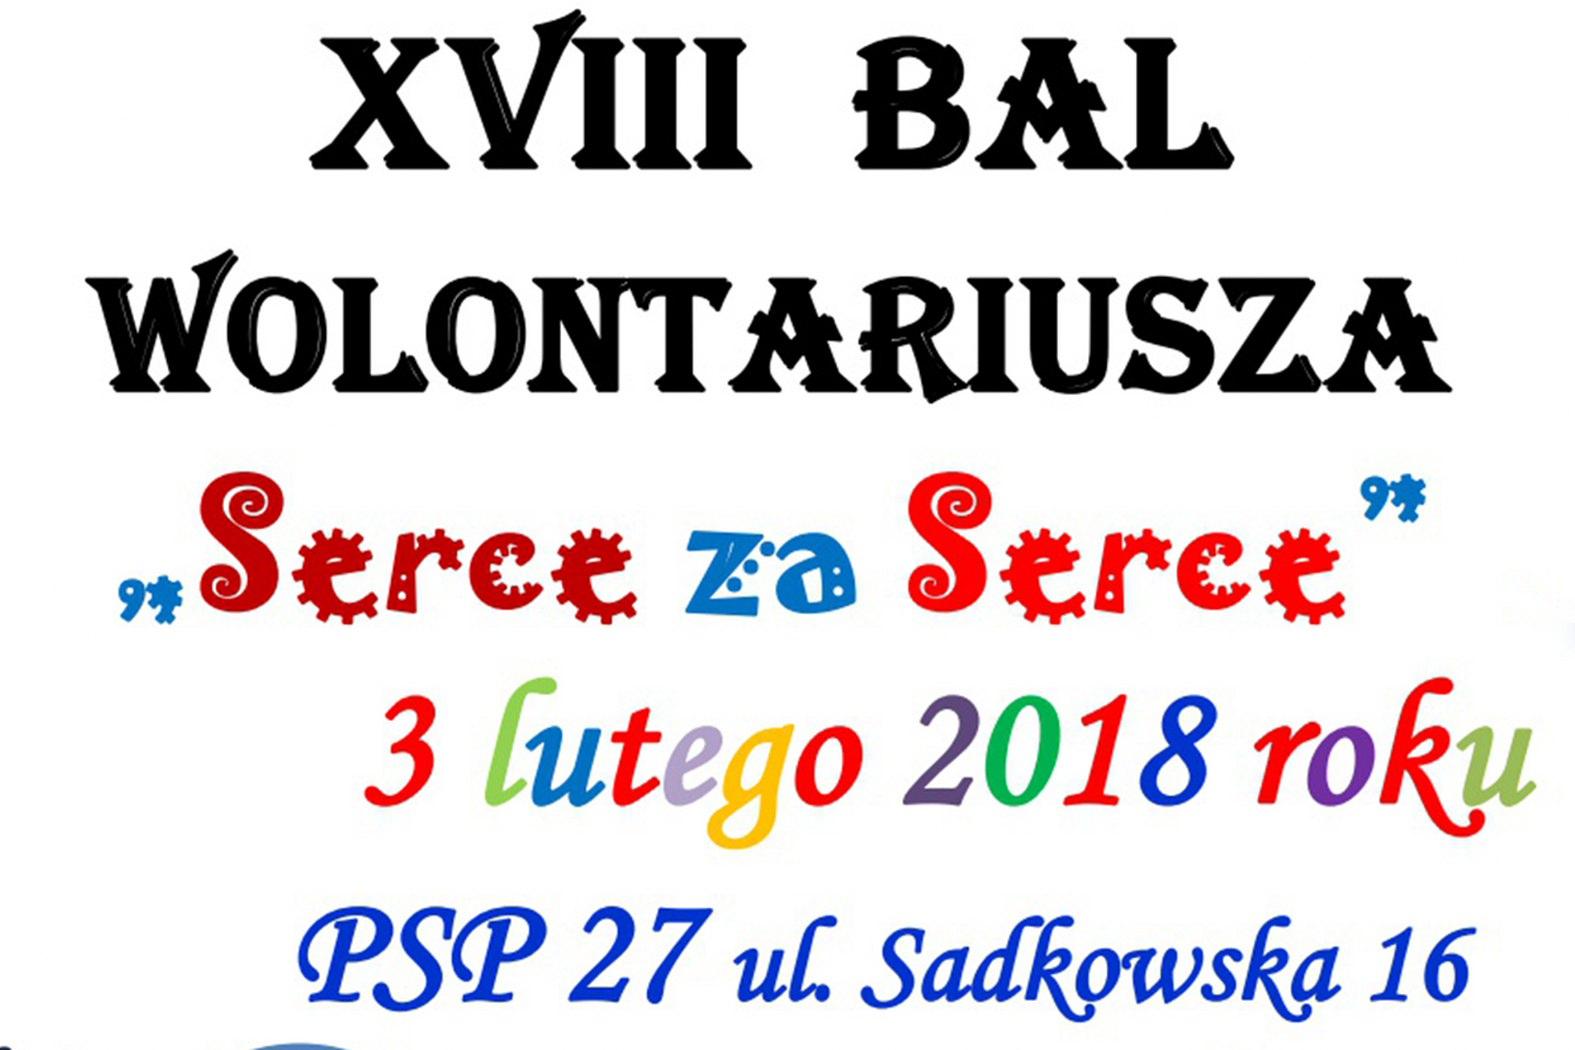 bal wolontariusza post thumb 1575x1050